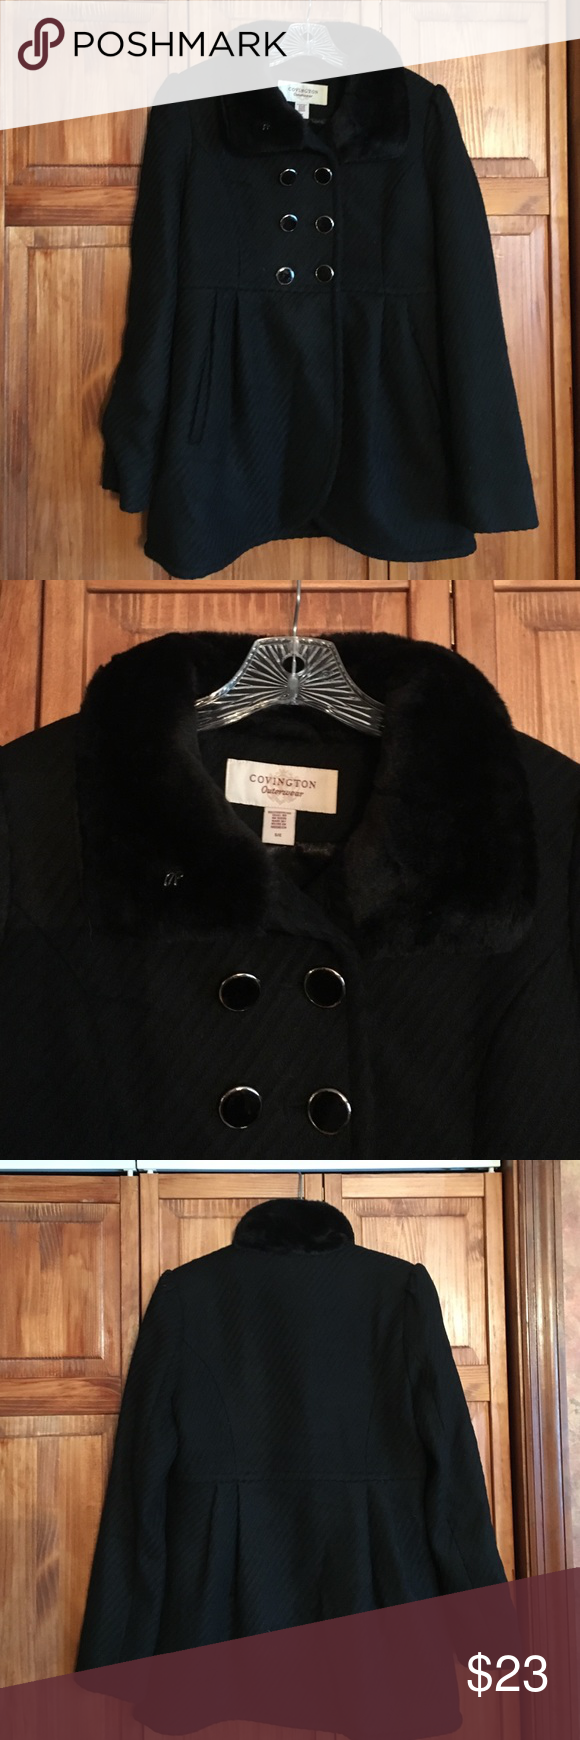 Covington Jacket With Fake Fur Collar Clothes Design Fur Collars Jackets [ 1740 x 580 Pixel ]